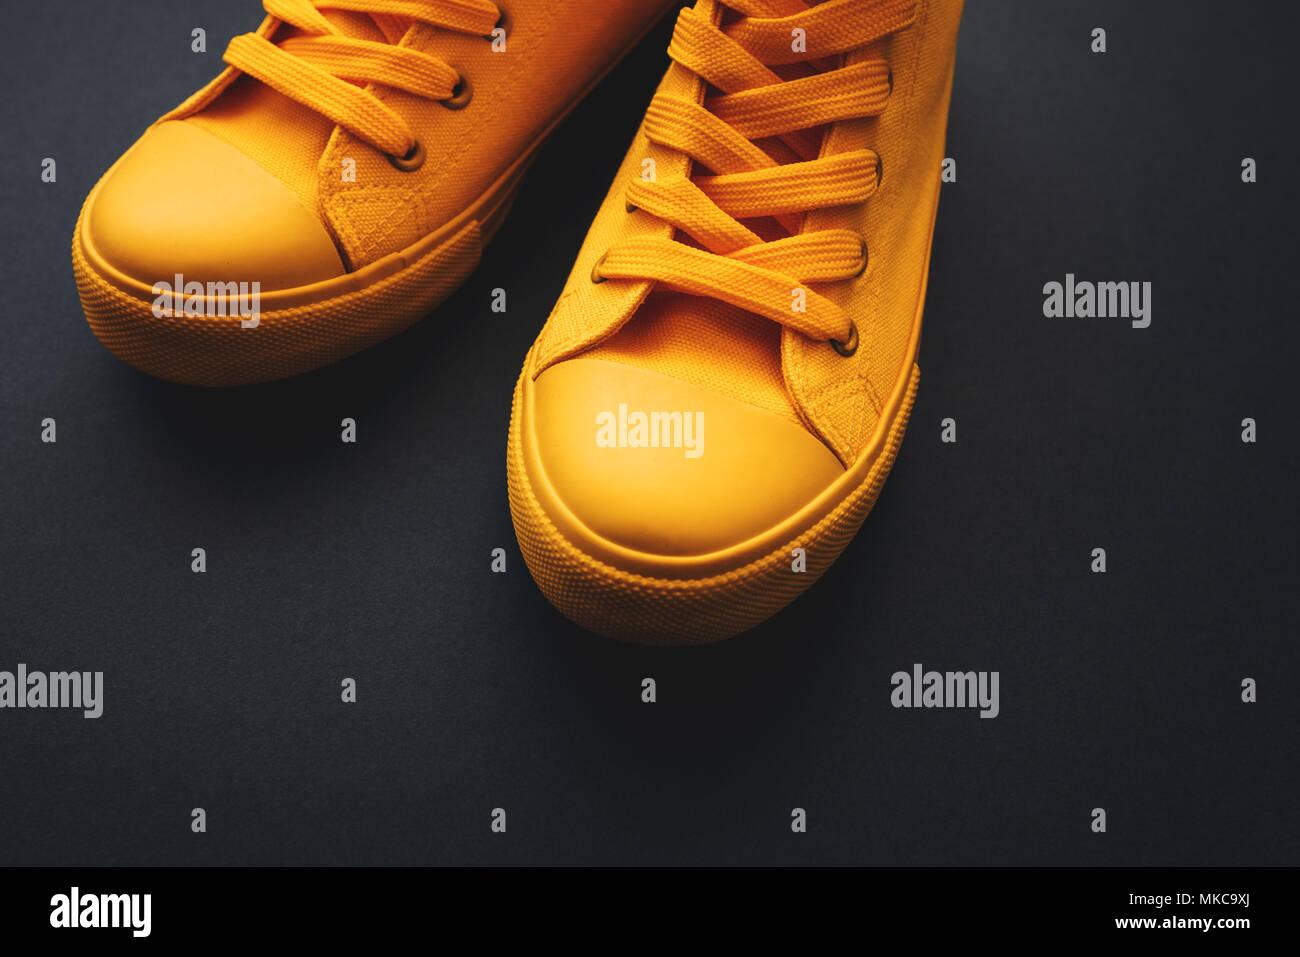 Stylish yellow sneakers on dark